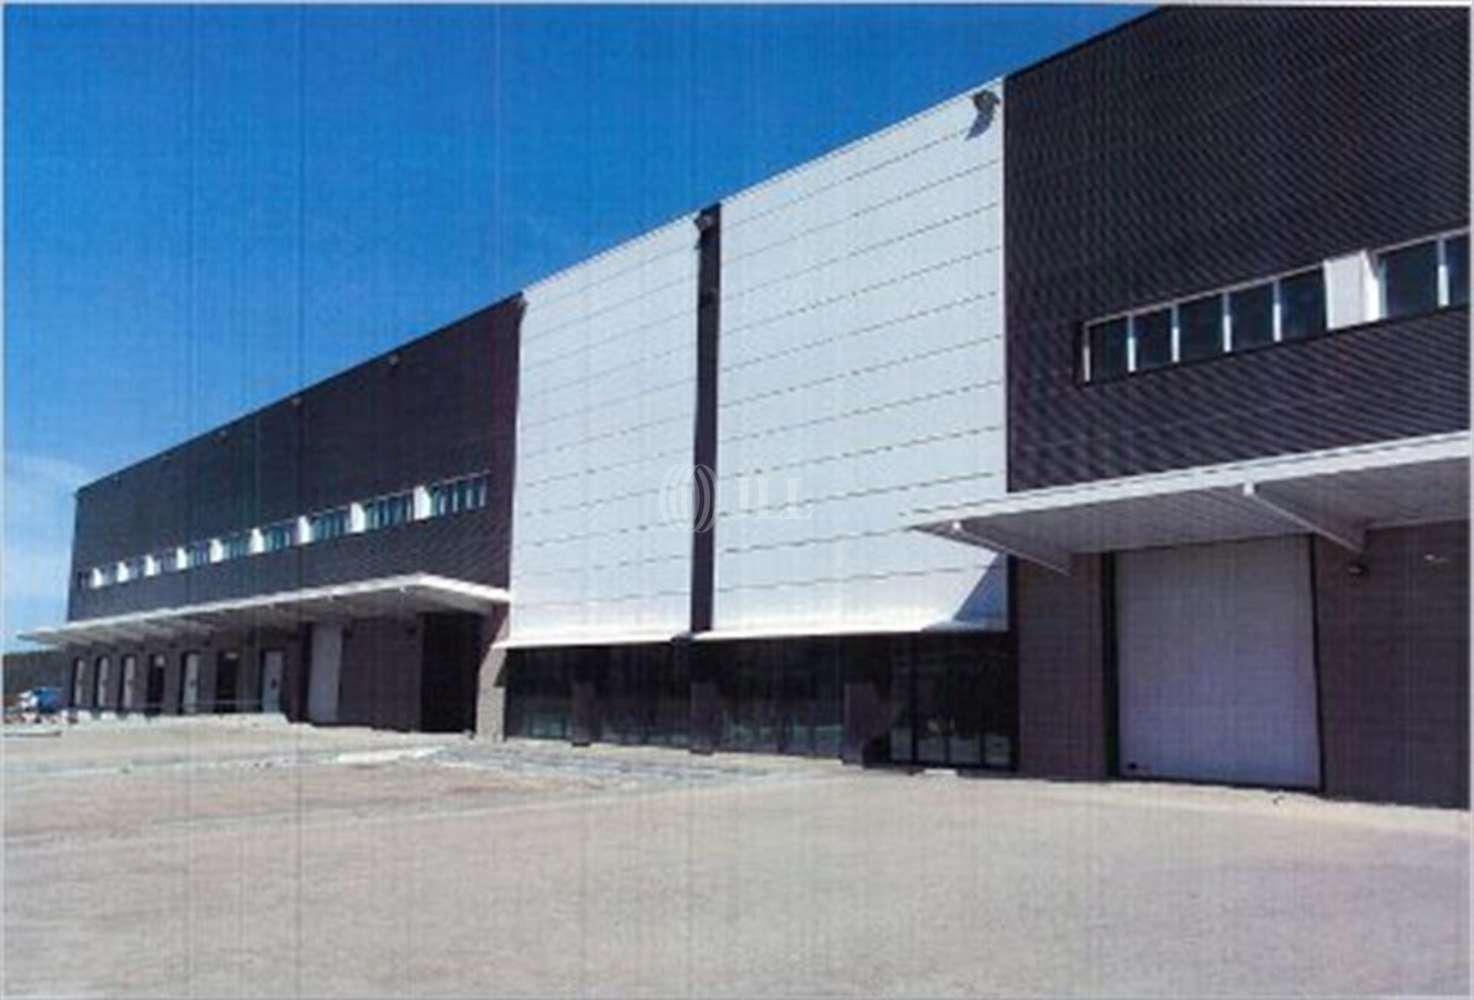 Naves industriales y logísticas Celrà, 17460 - Nave Logistica - B0401 - PI CELRÀ - 10513